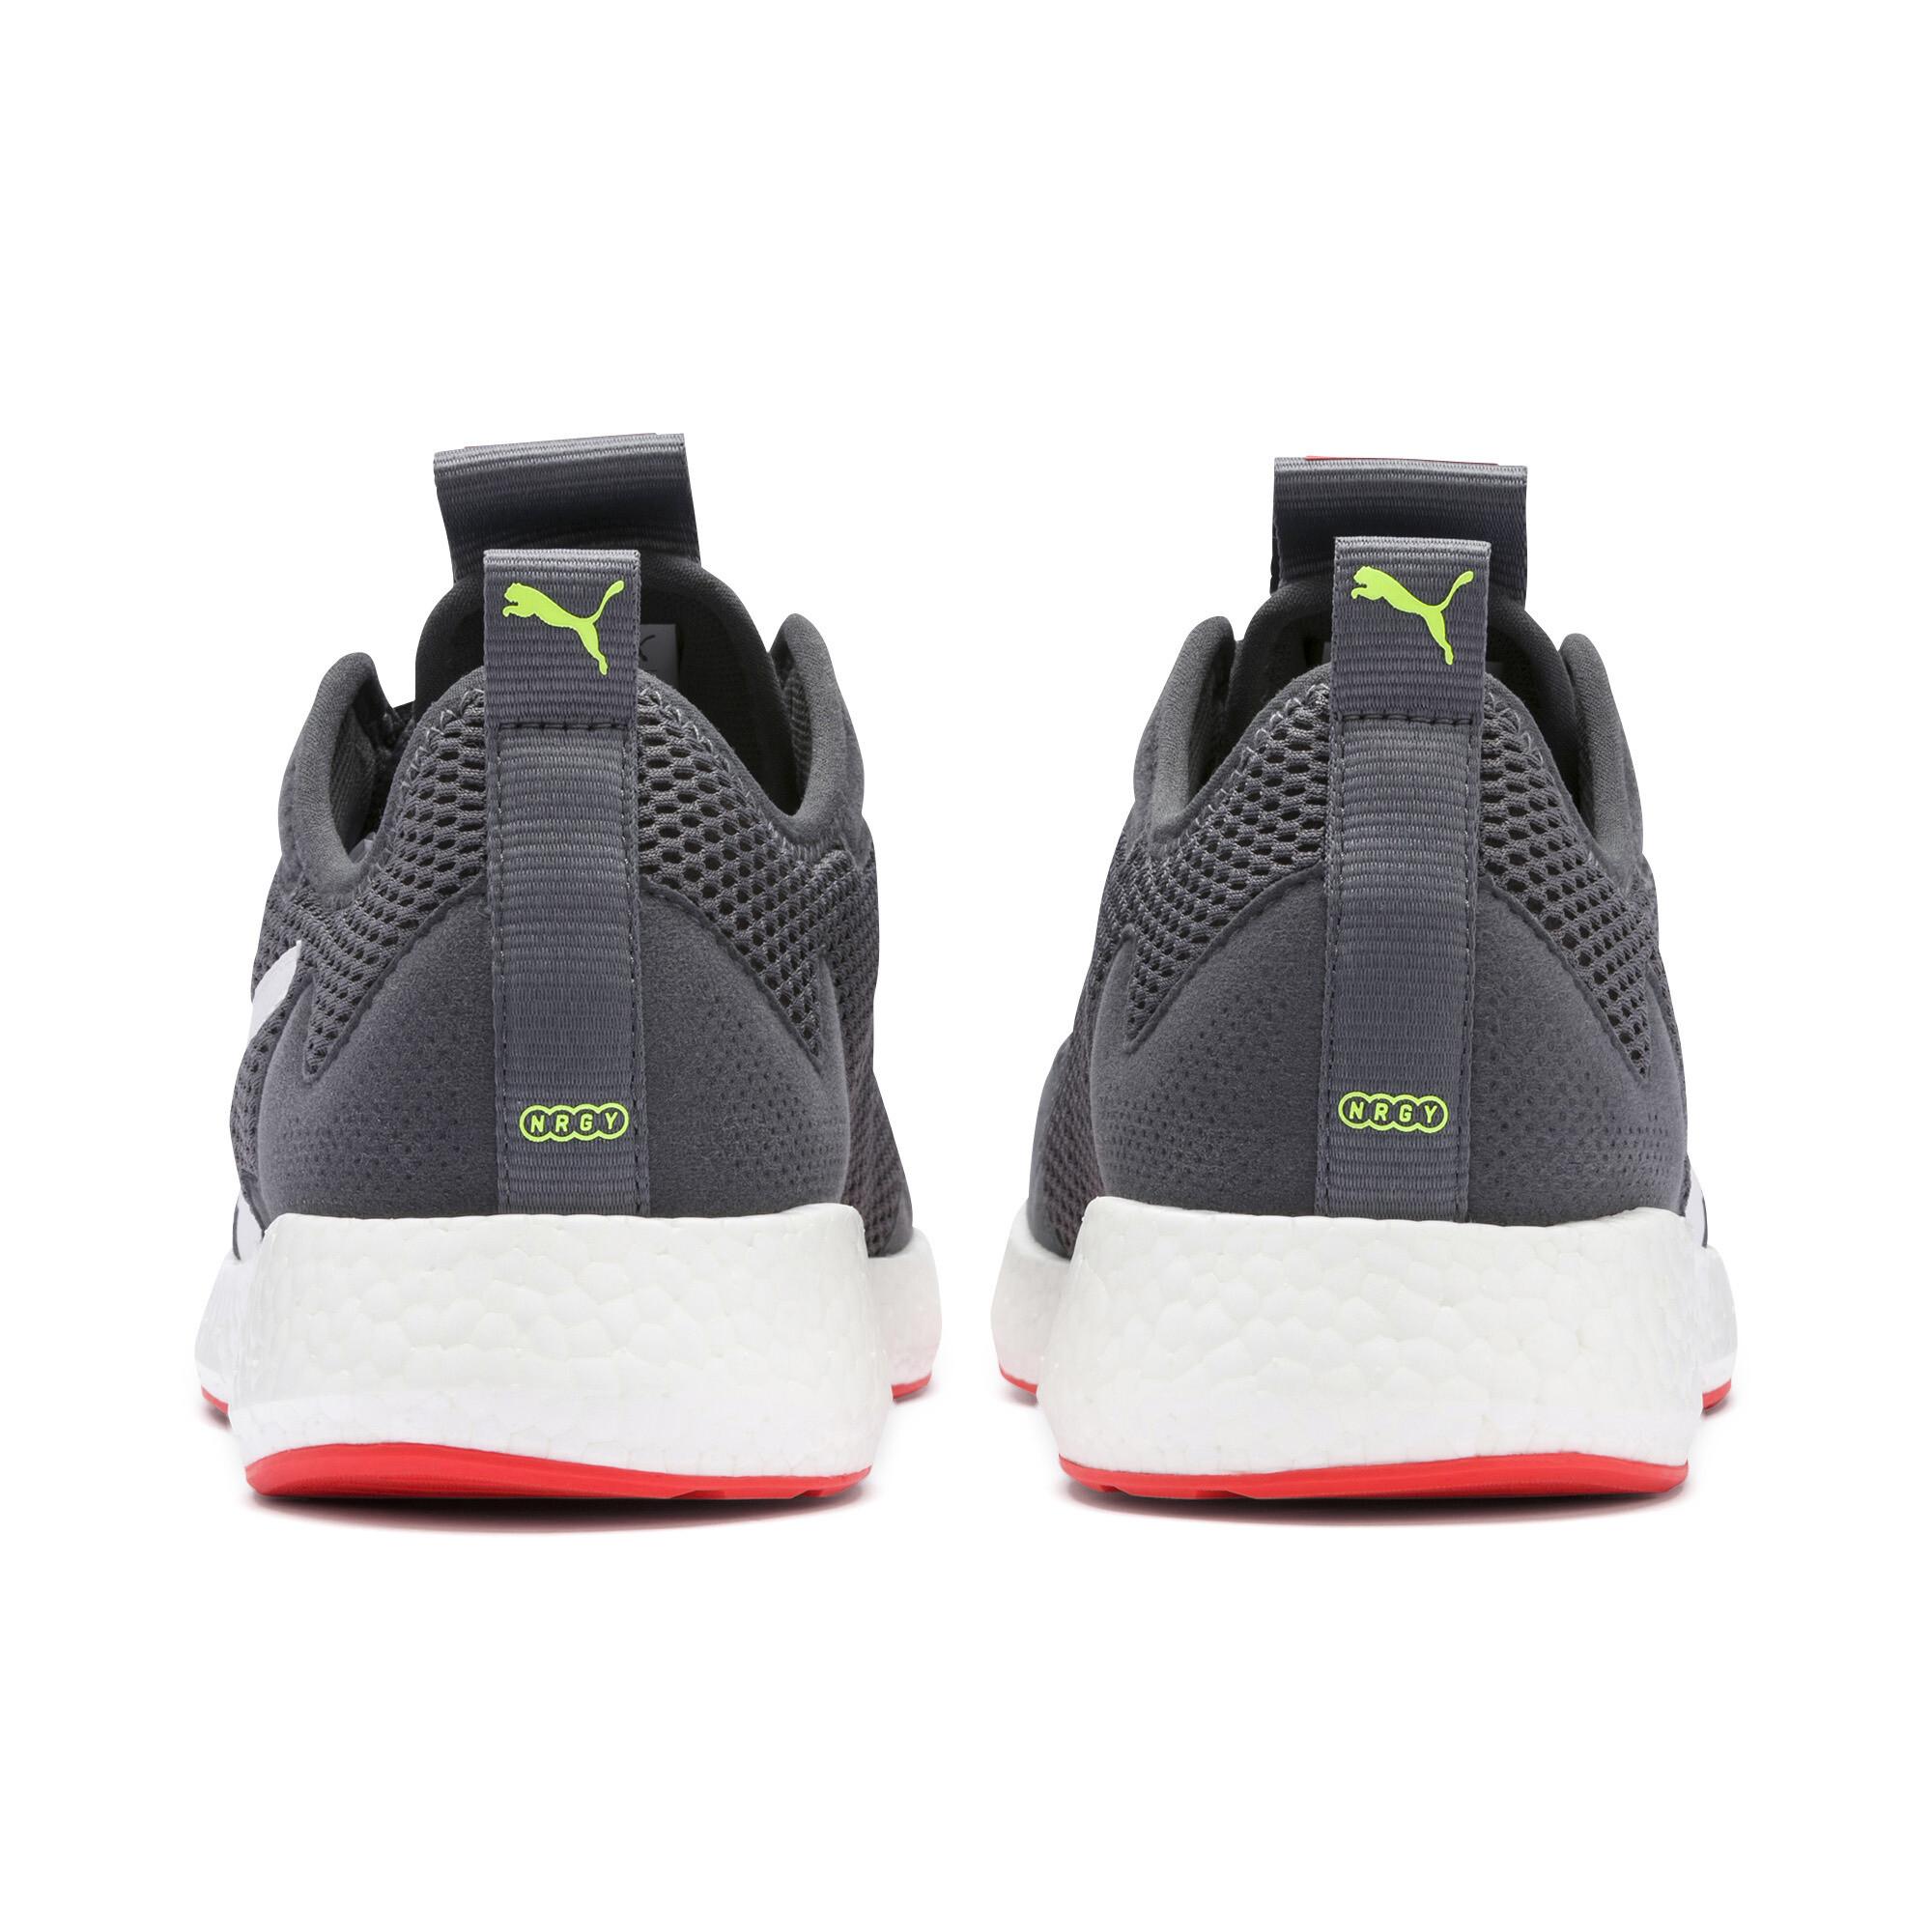 PUMA-NRGY-Neko-Skim-Men-s-Running-Shoes-Men-Shoe-Running thumbnail 8